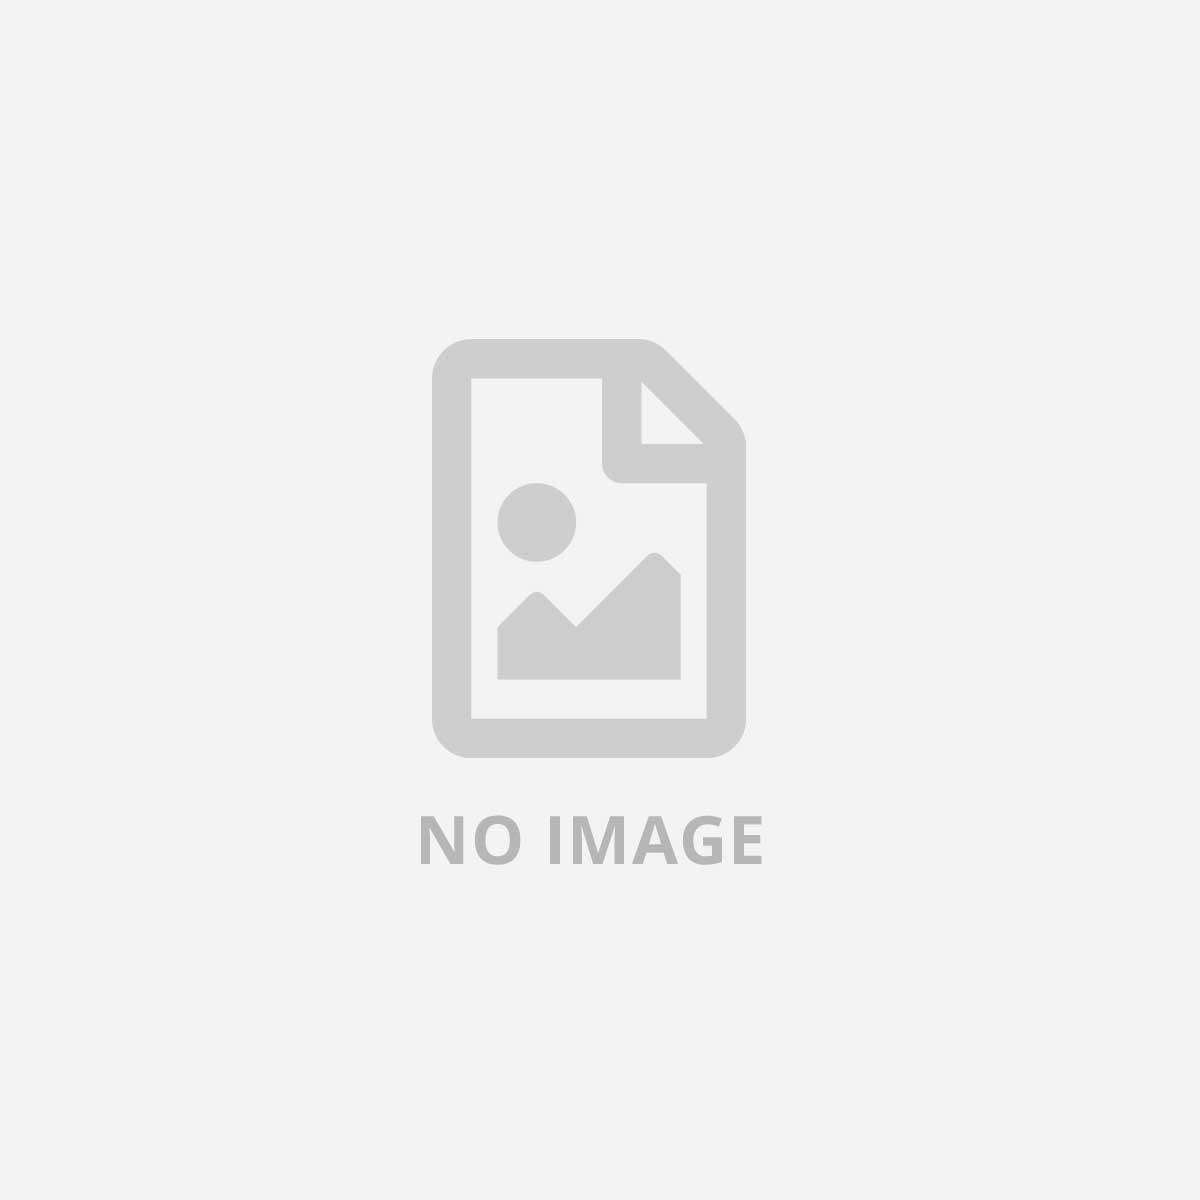 KASPERSKY KAS SECUR X MS OFFICE 365 (150-249)